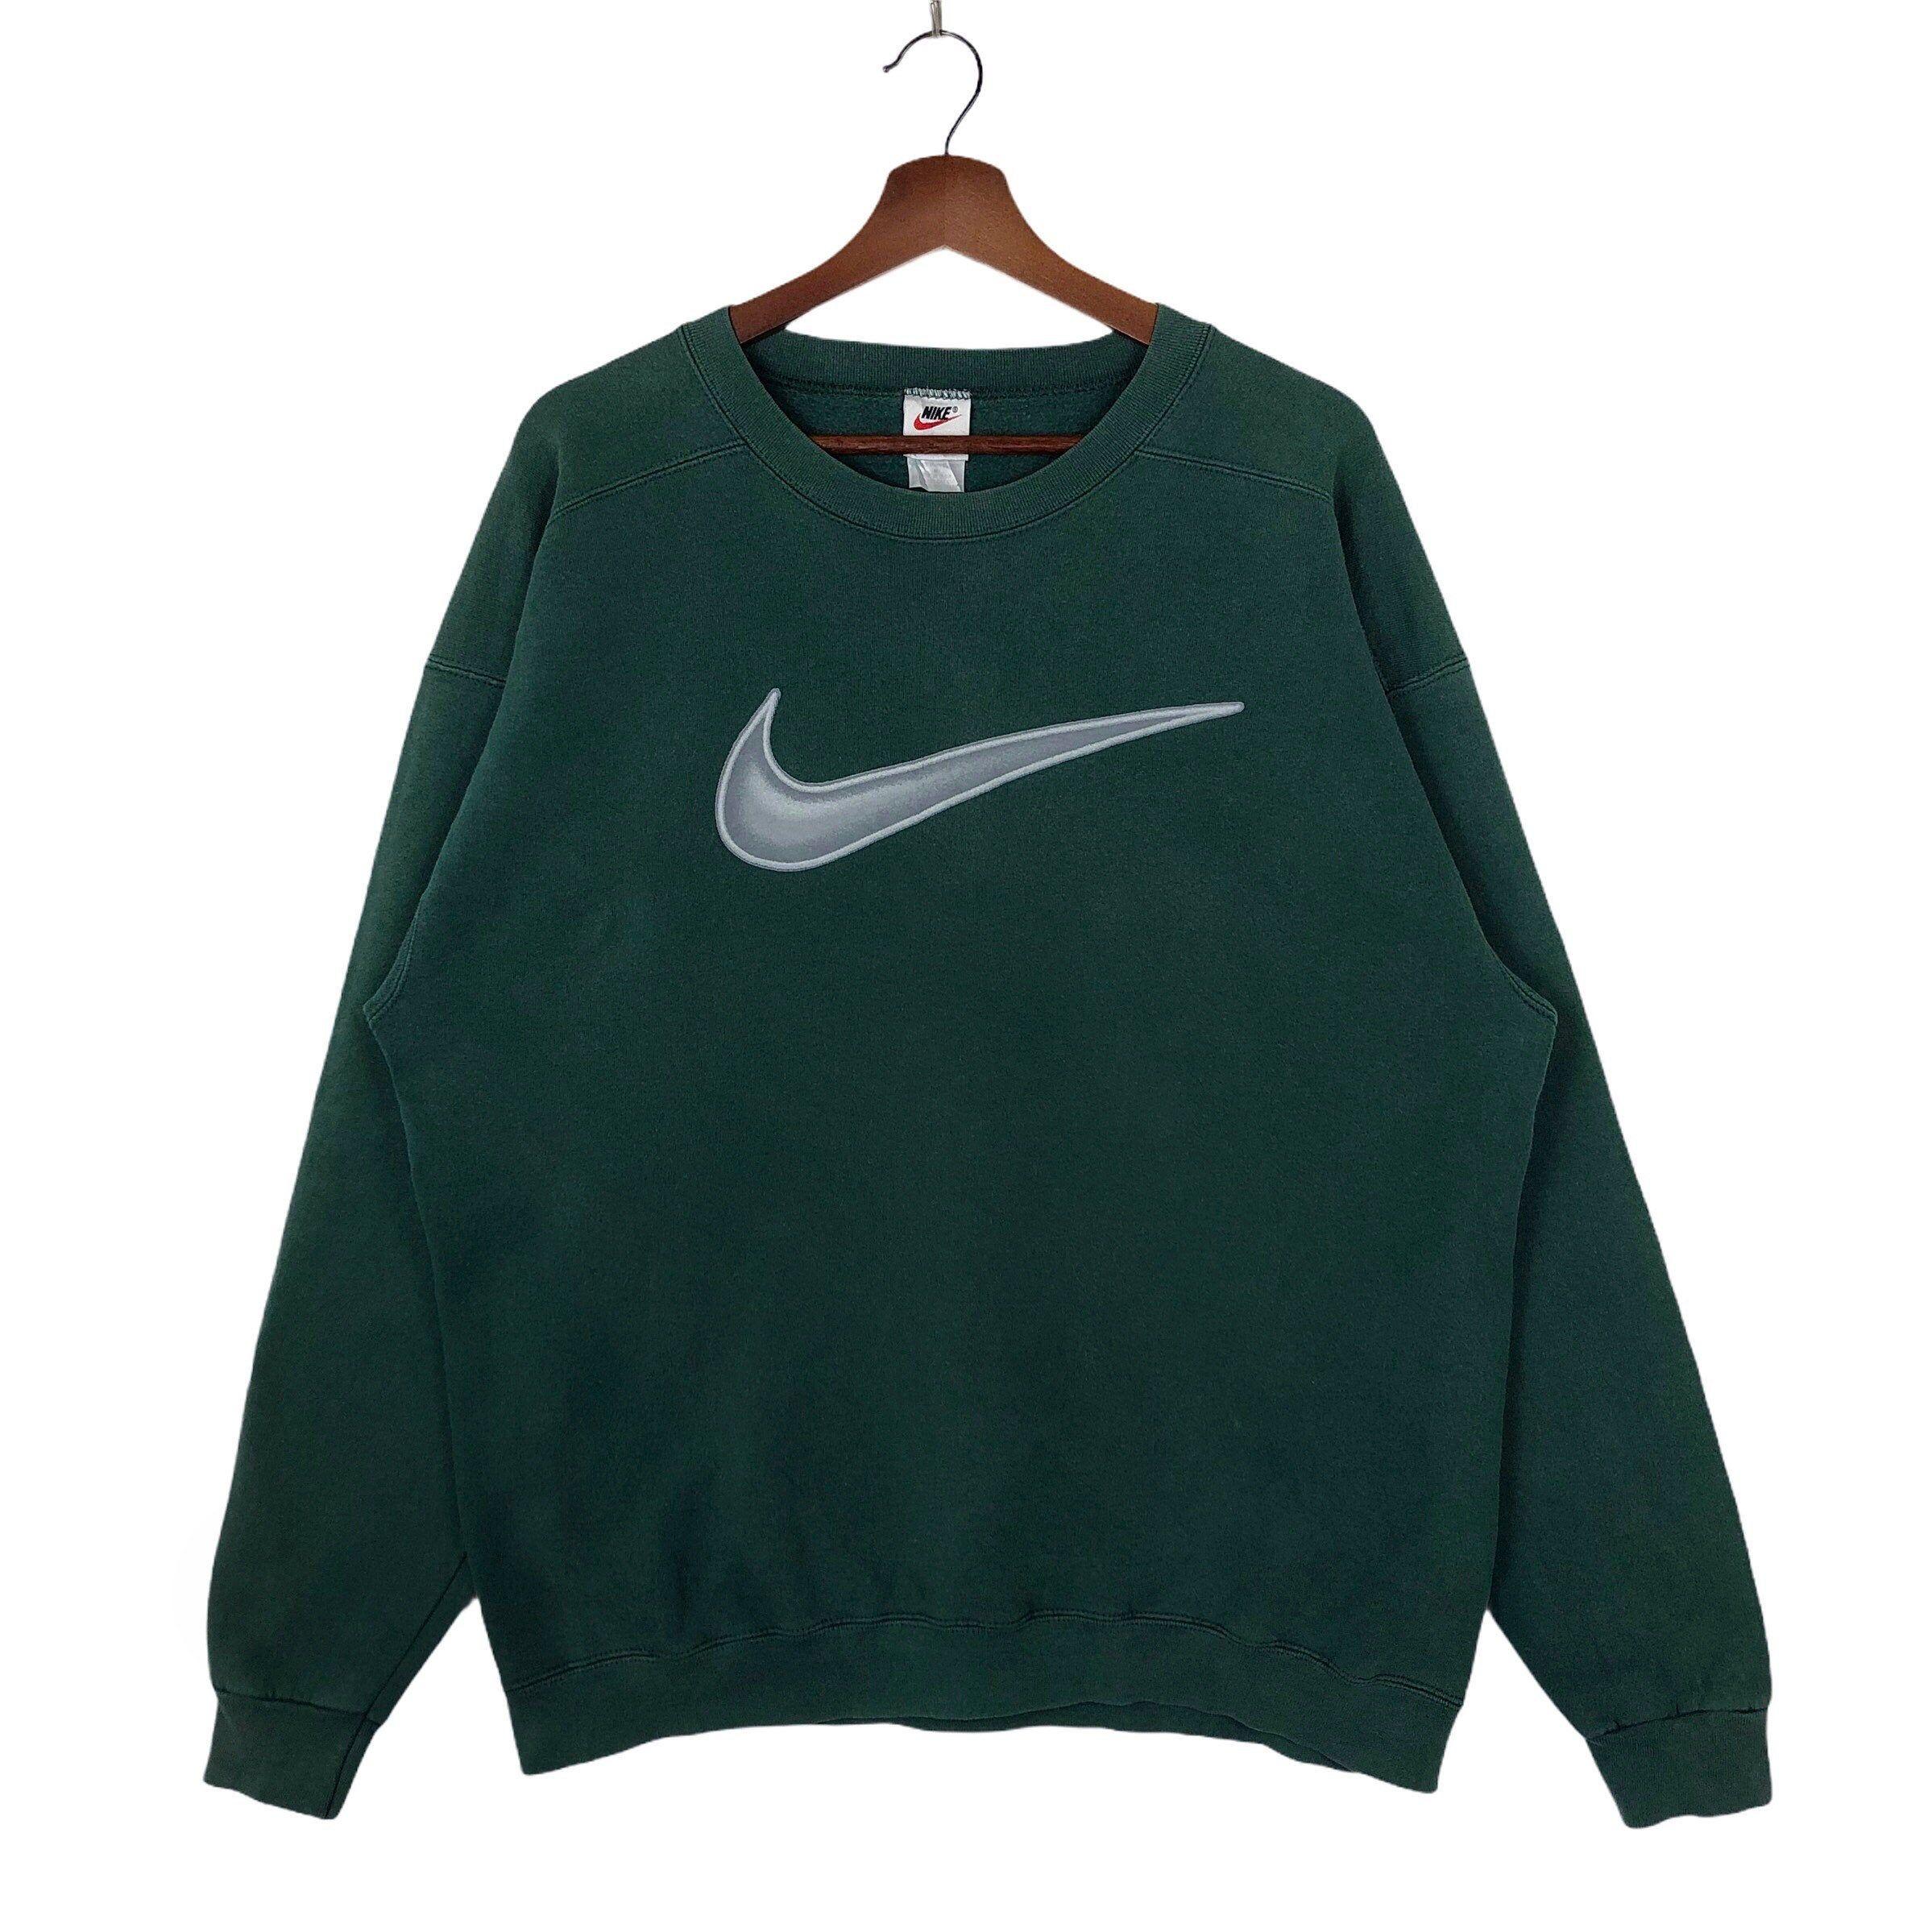 Vintage Green Nike Sweatshirt Crewneck Neon Nike Swoosh Big Logo Nike Vintage Sweatshirt Pullover Jumper Made In Usa Vintage Sweatshirt Vintage Nike Sweatshirt Sweatshirts [ 2398 x 2398 Pixel ]